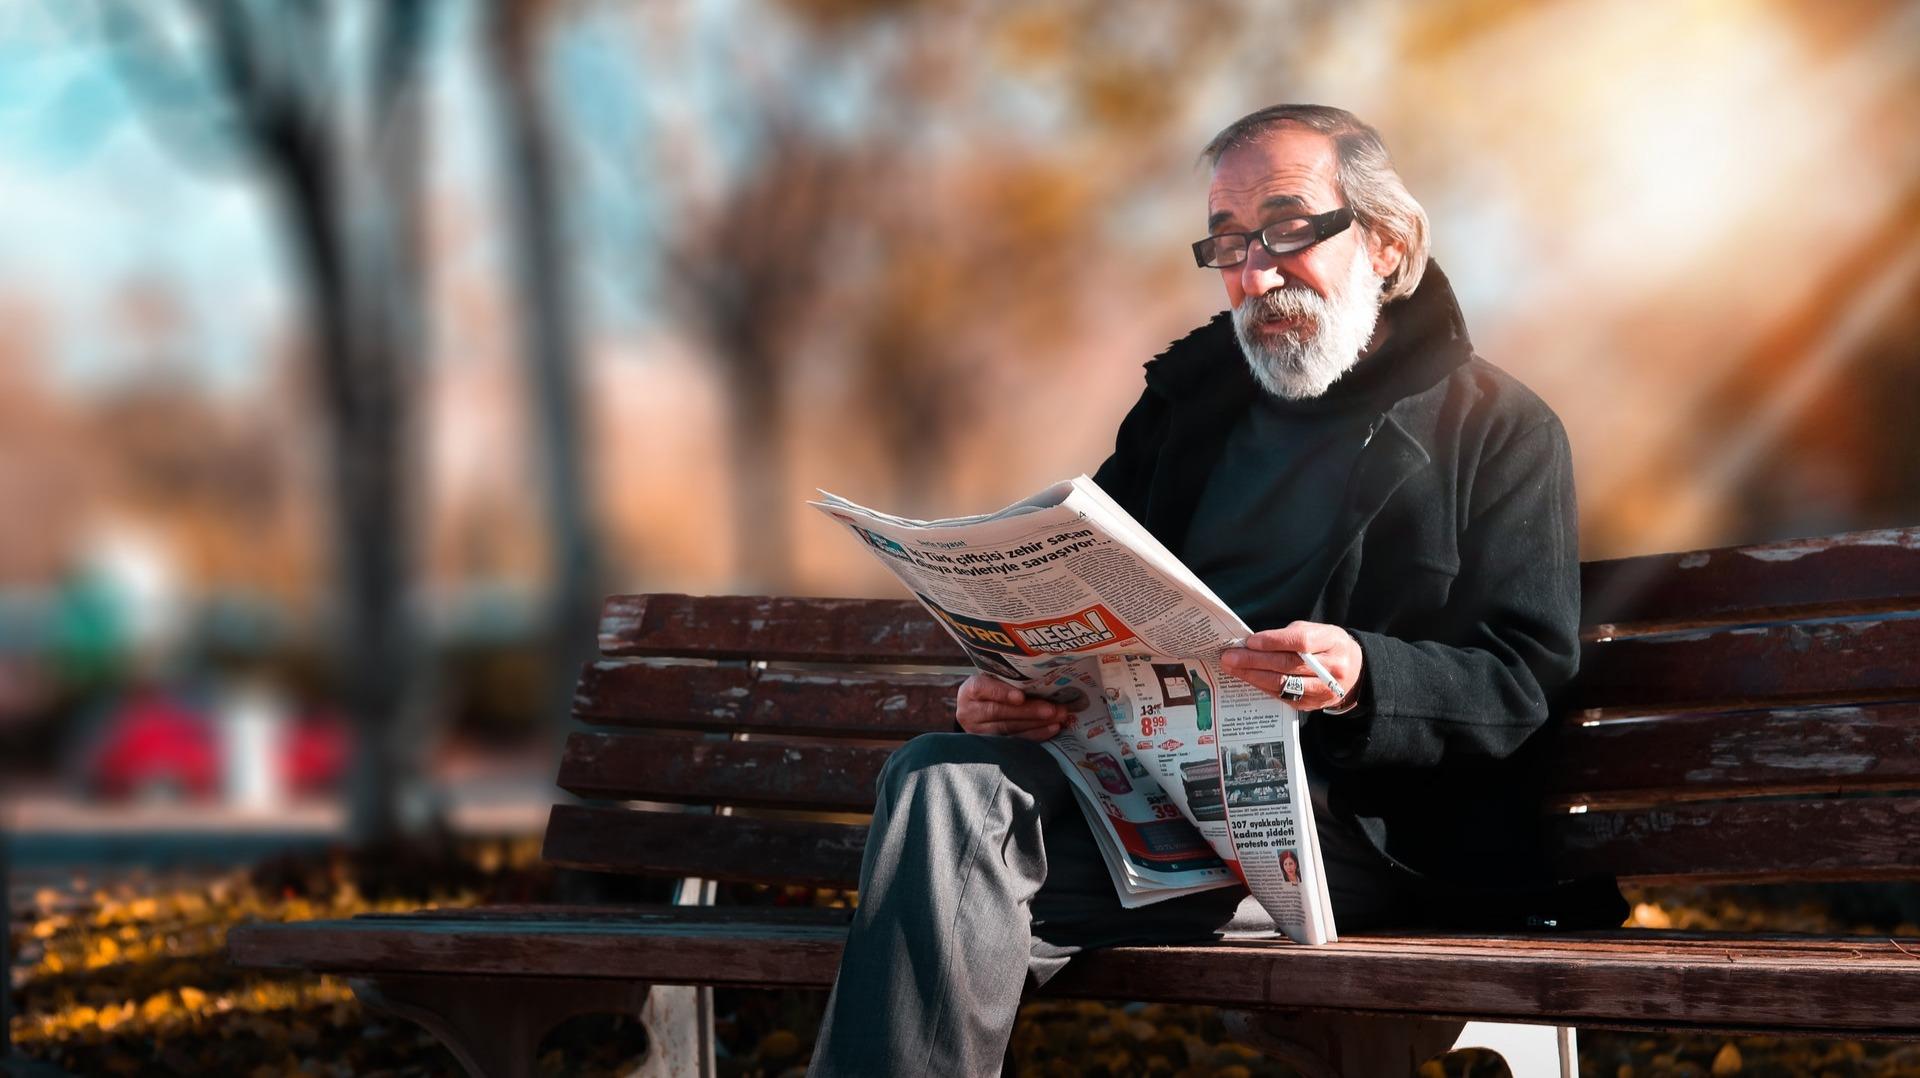 https://www.pexels.com/photo/photo-of-man-reading-newspaper-1652340/